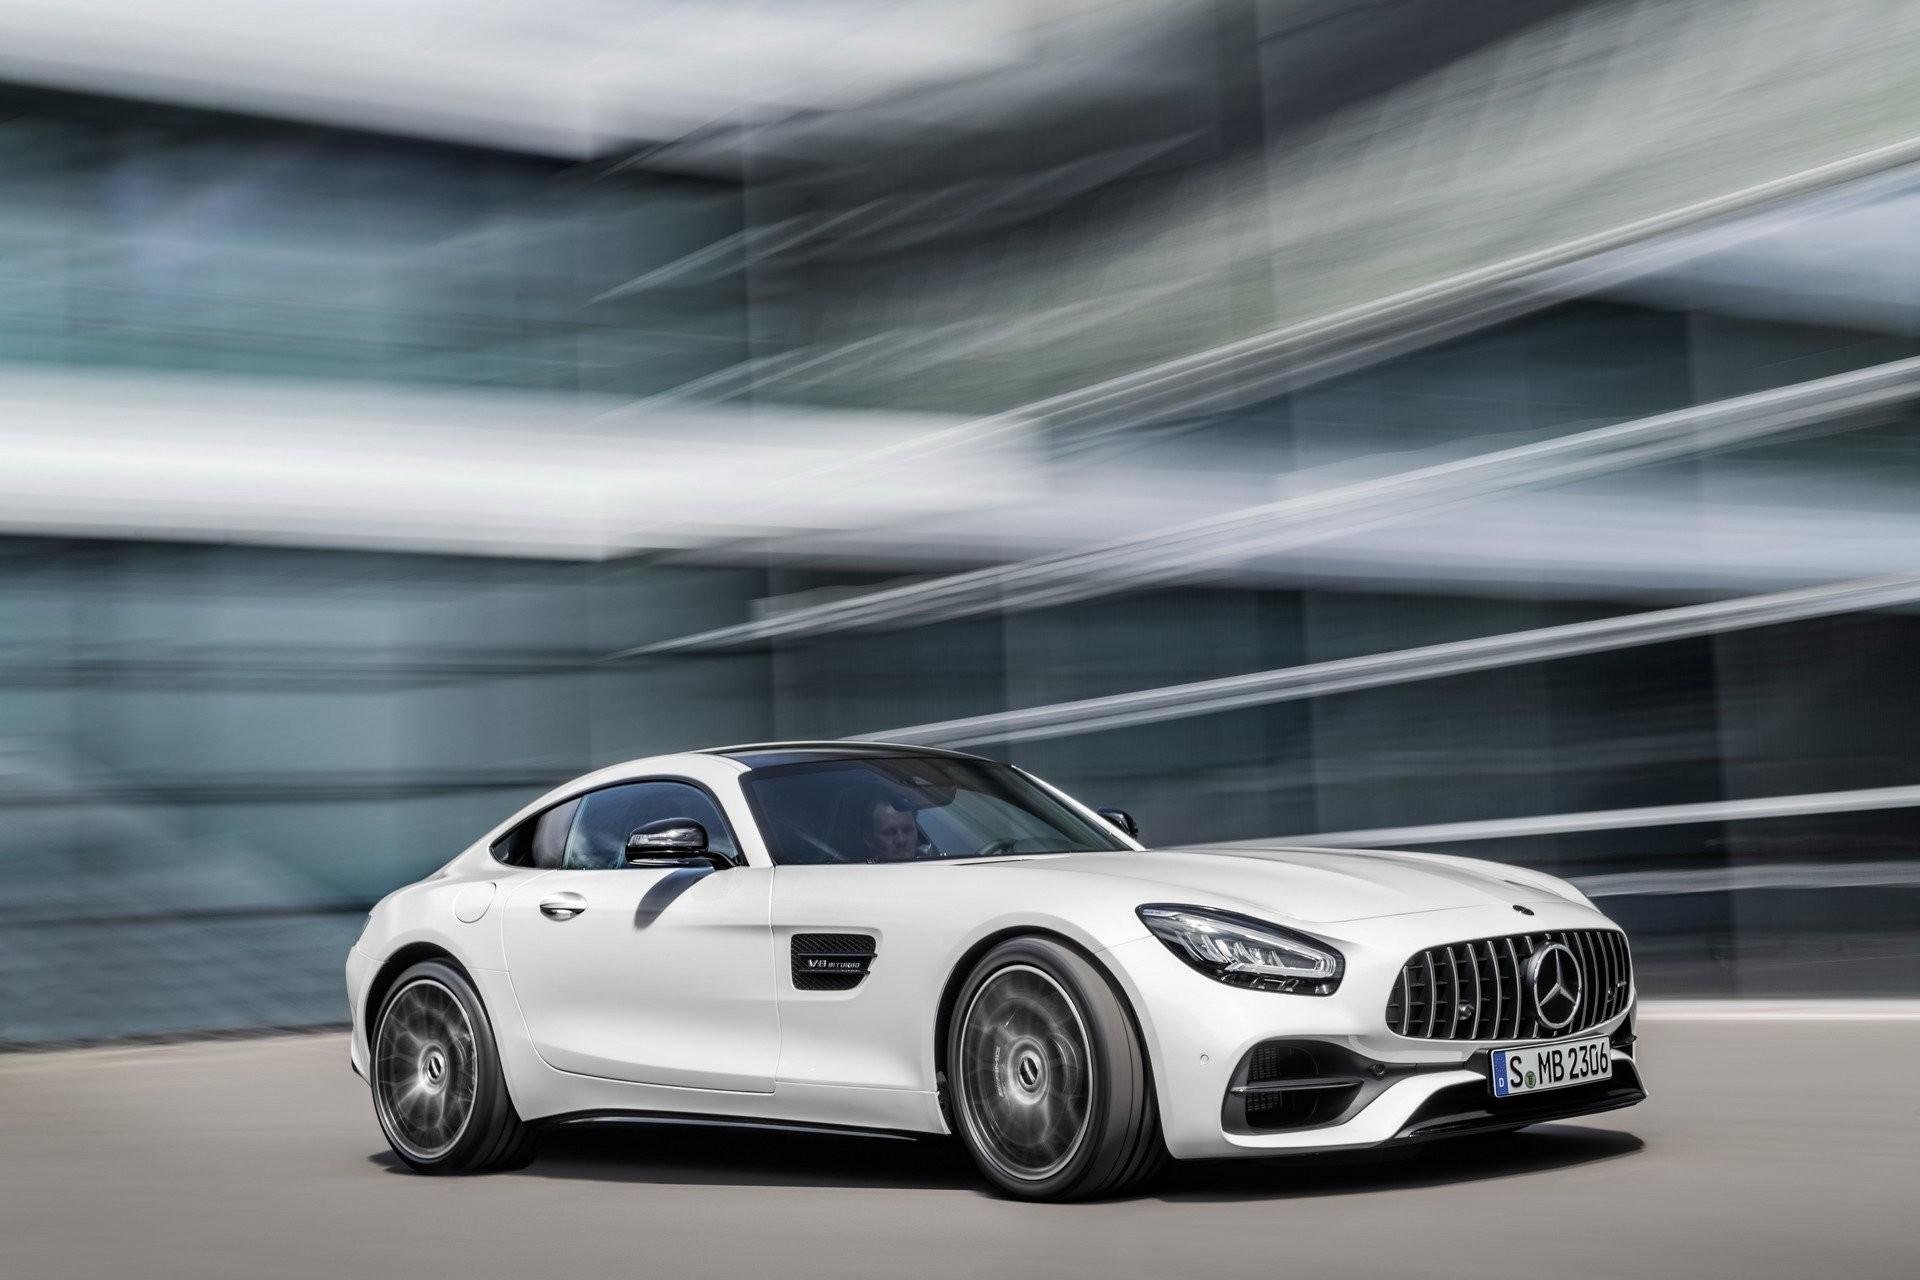 Mercedes-AMG GT 2020